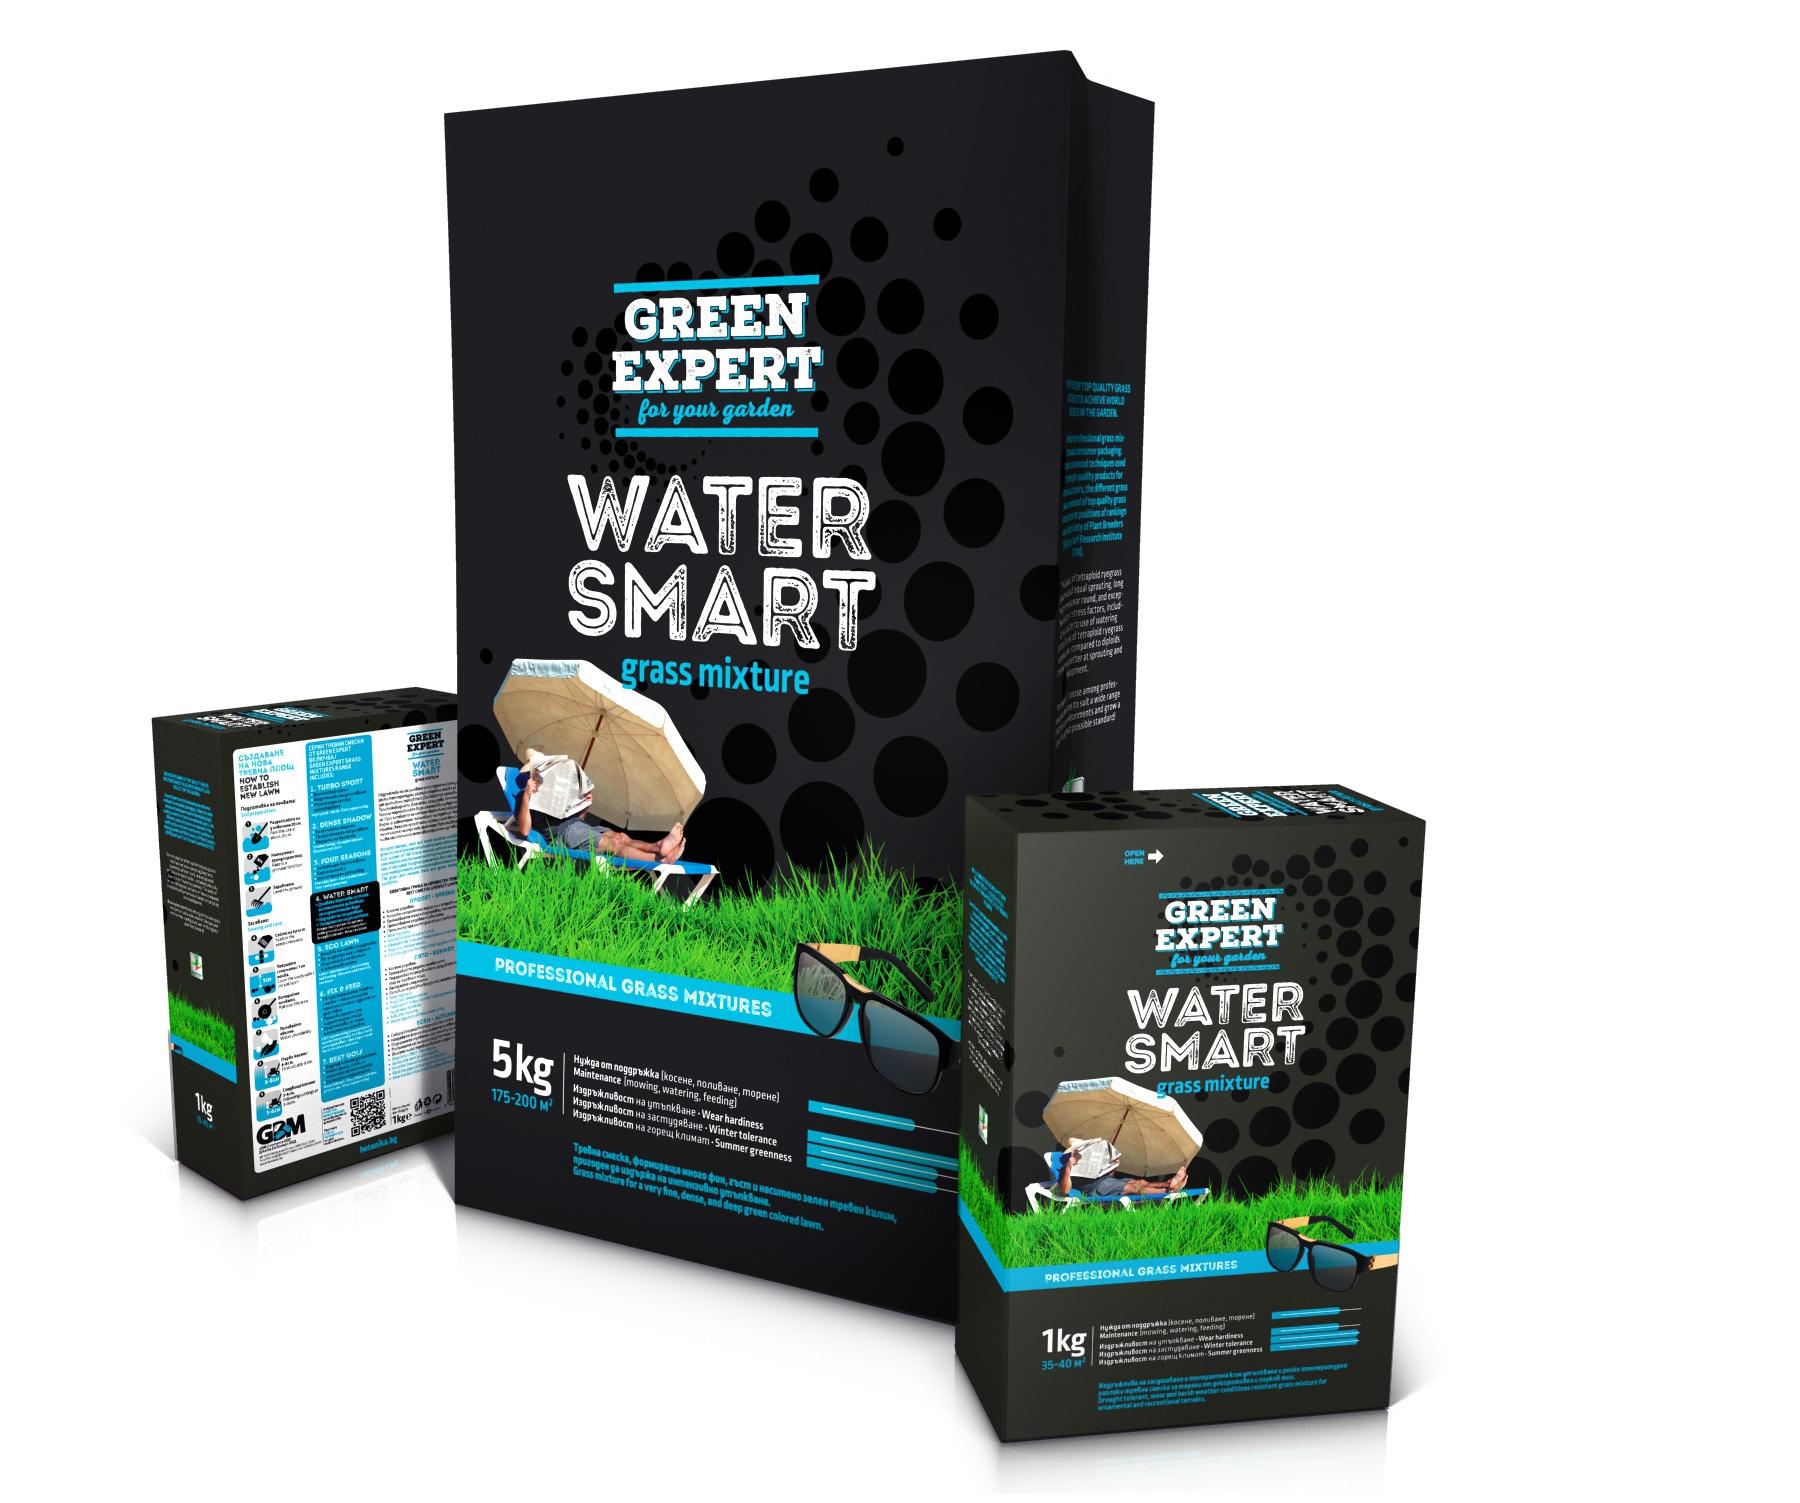 Green Expert Water Smart упаковки